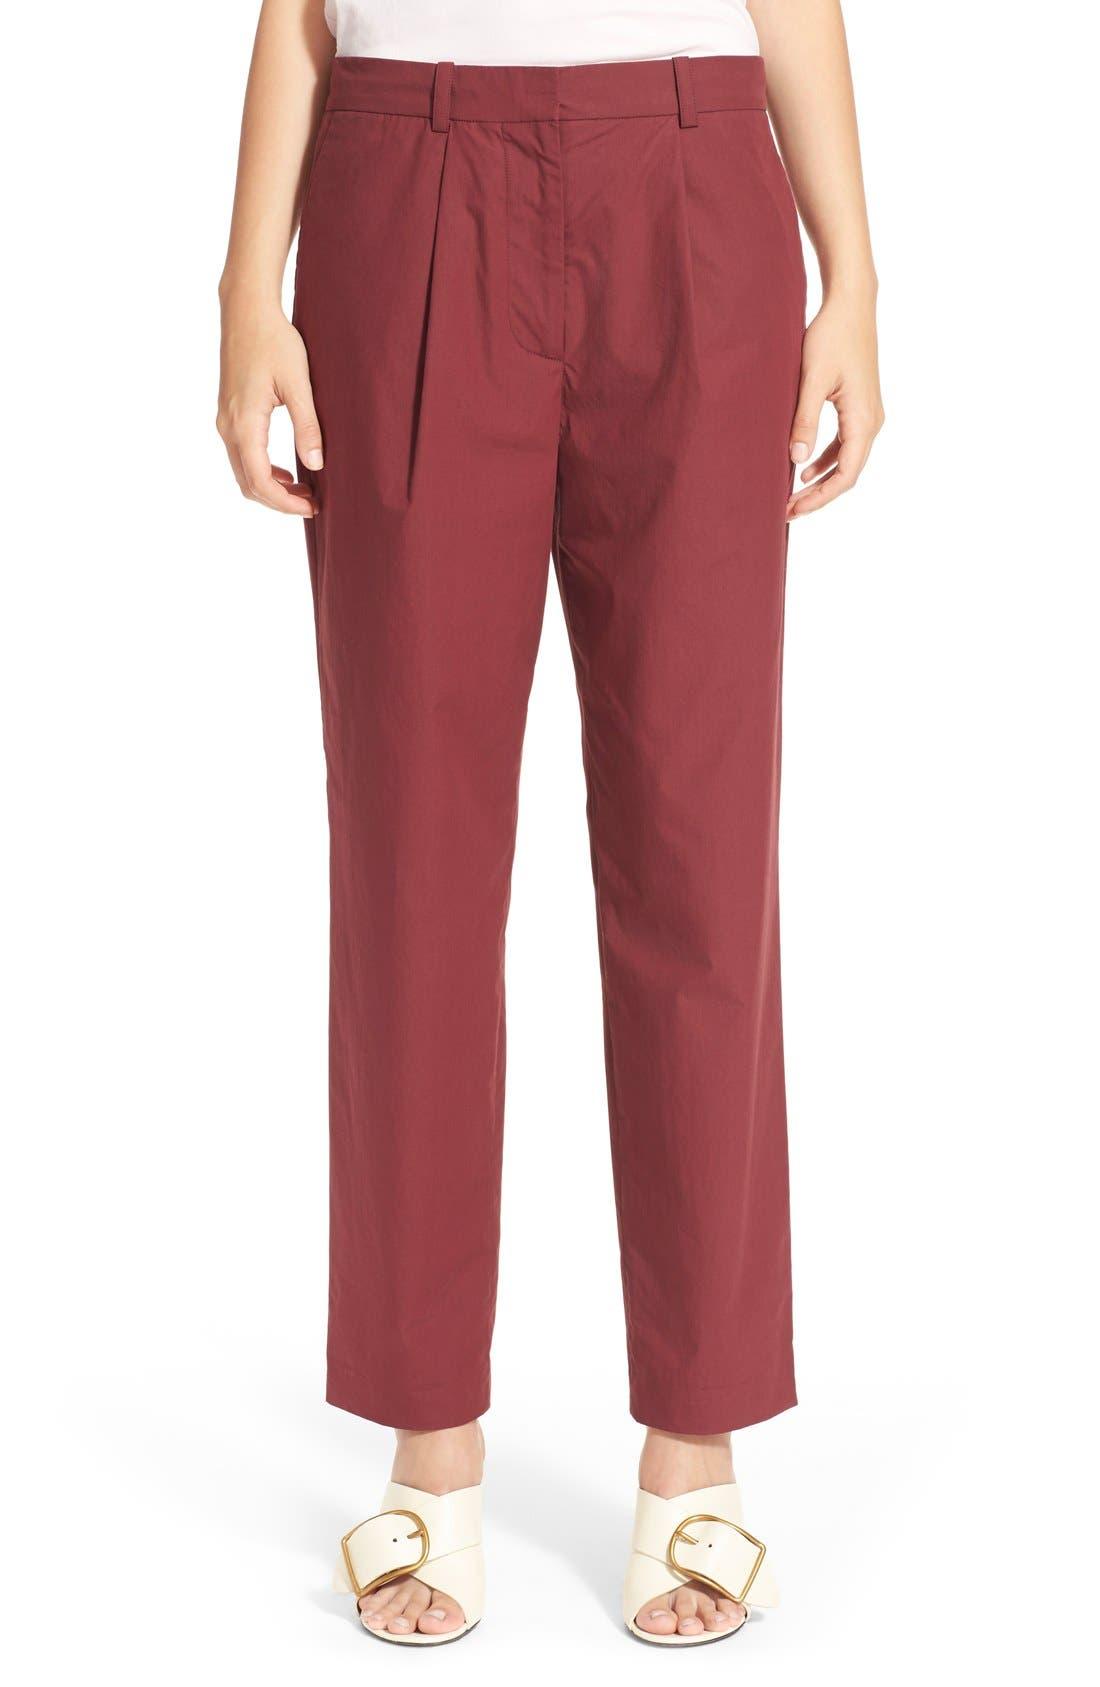 Alternate Image 1 Selected - ACNE Studios 'Onno Pop' Suit Trousers